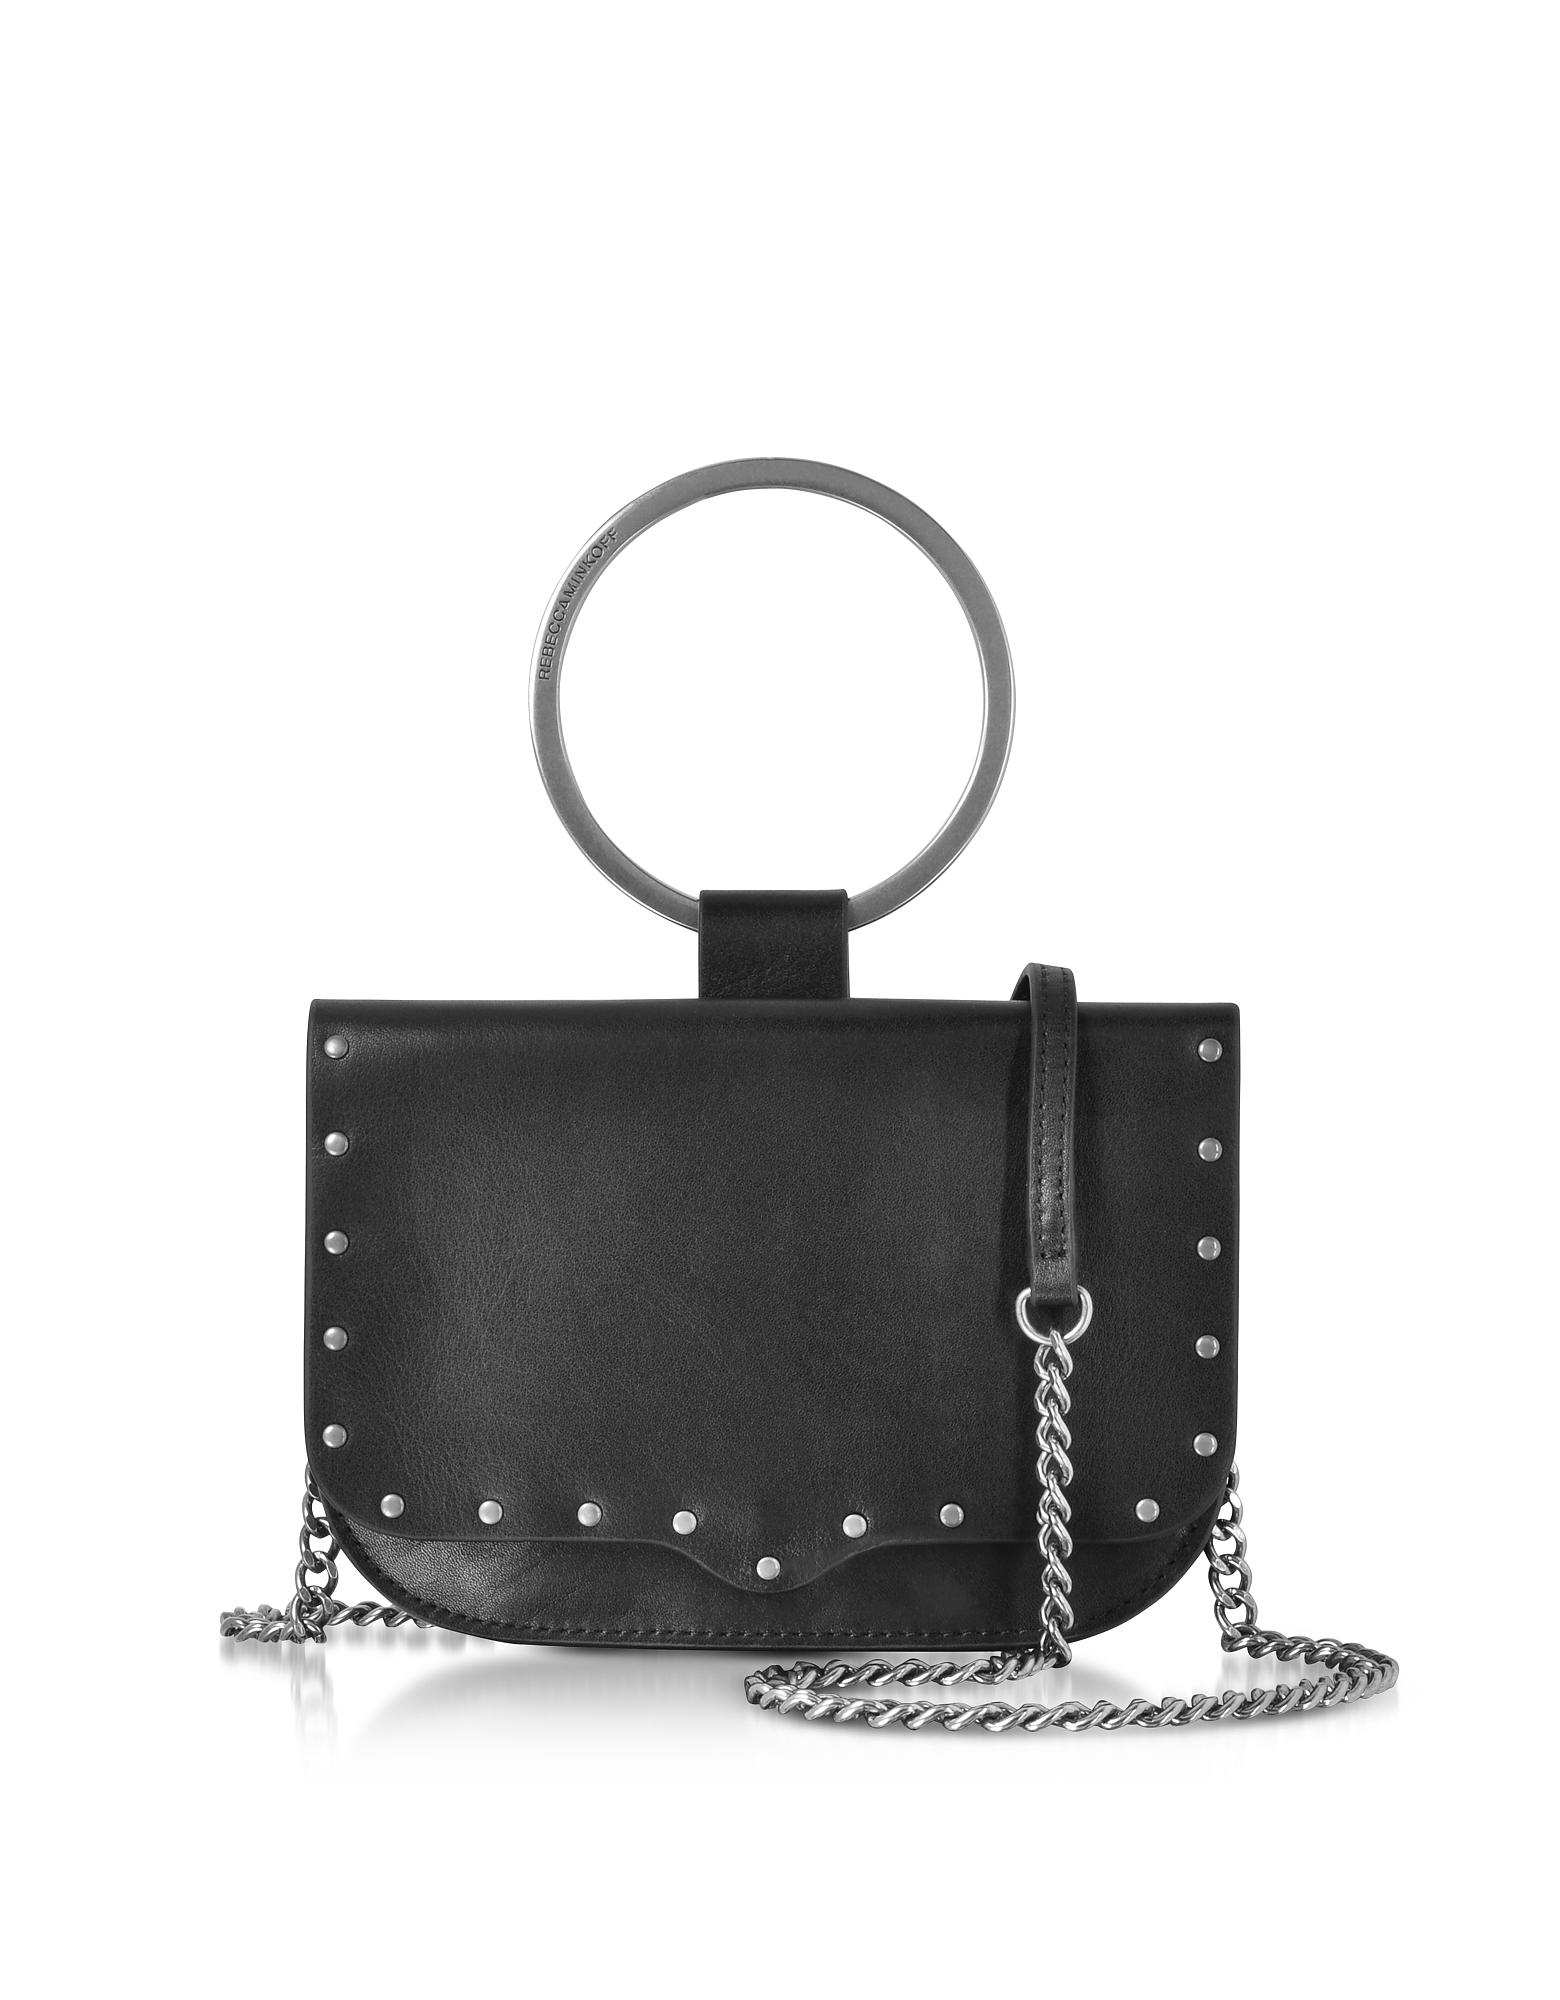 Image of Rebecca Minkoff Designer Handbags, Black Leather Ring Crossbody Bag